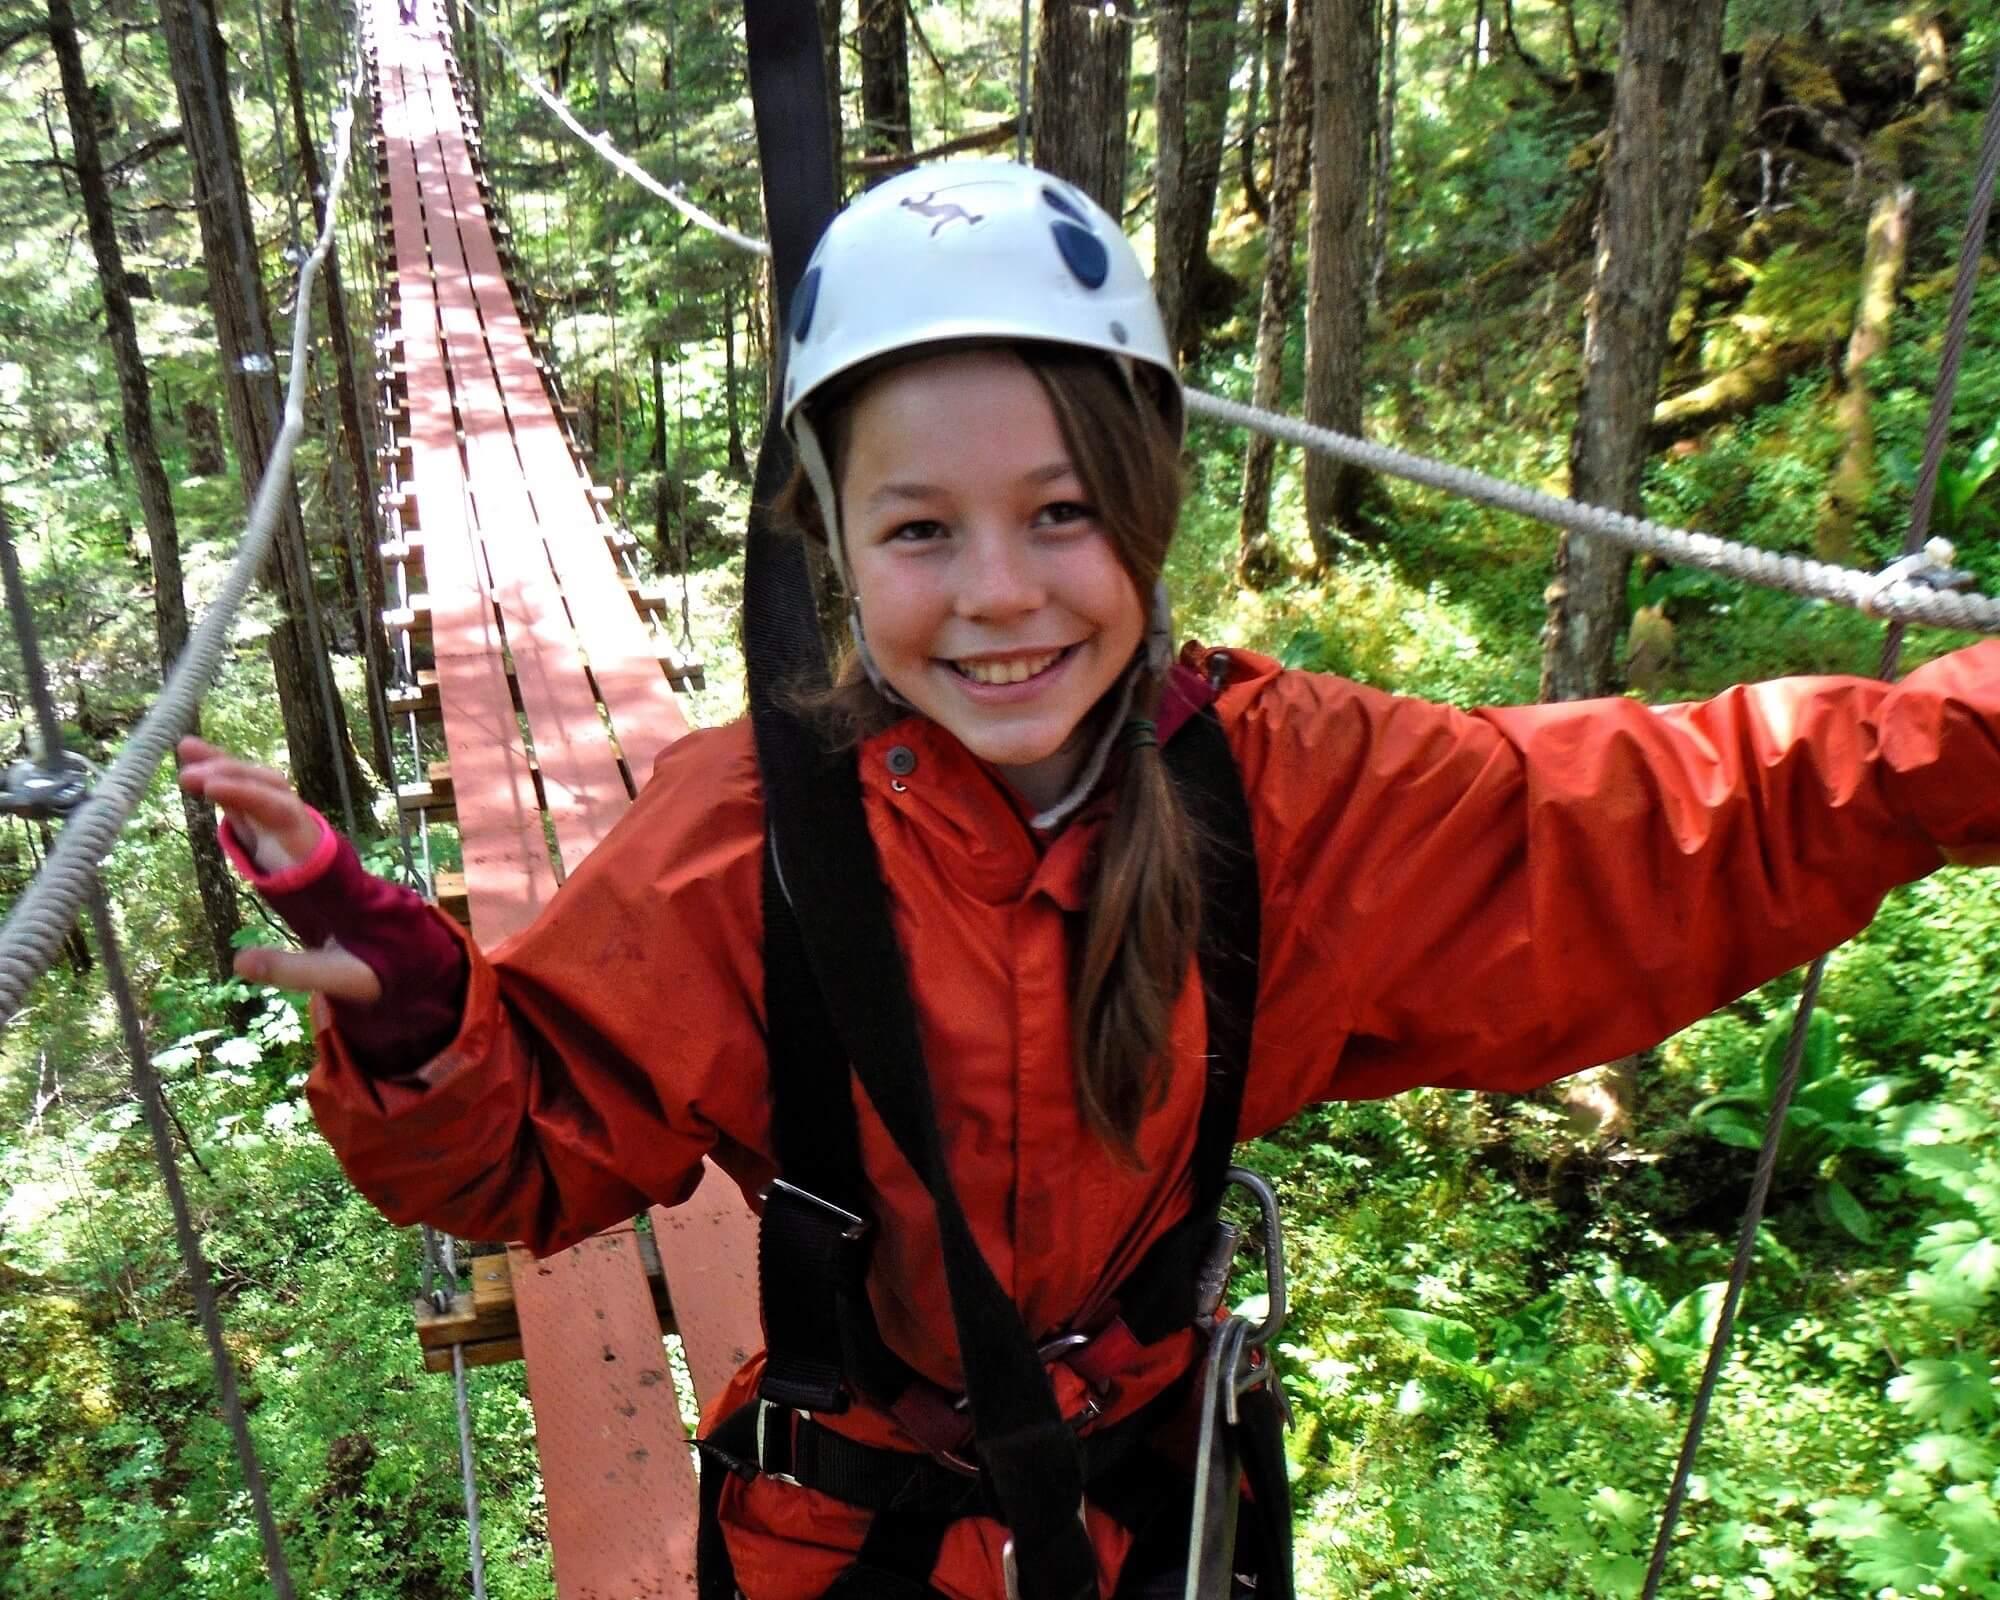 https://secureservercdn.net/72.167.241.180/c2p.415.myftpupload.com/wp-content/uploads/2018/10/Juneau-zip-Girl-crossing-Bridge.jpg?time=1634200883